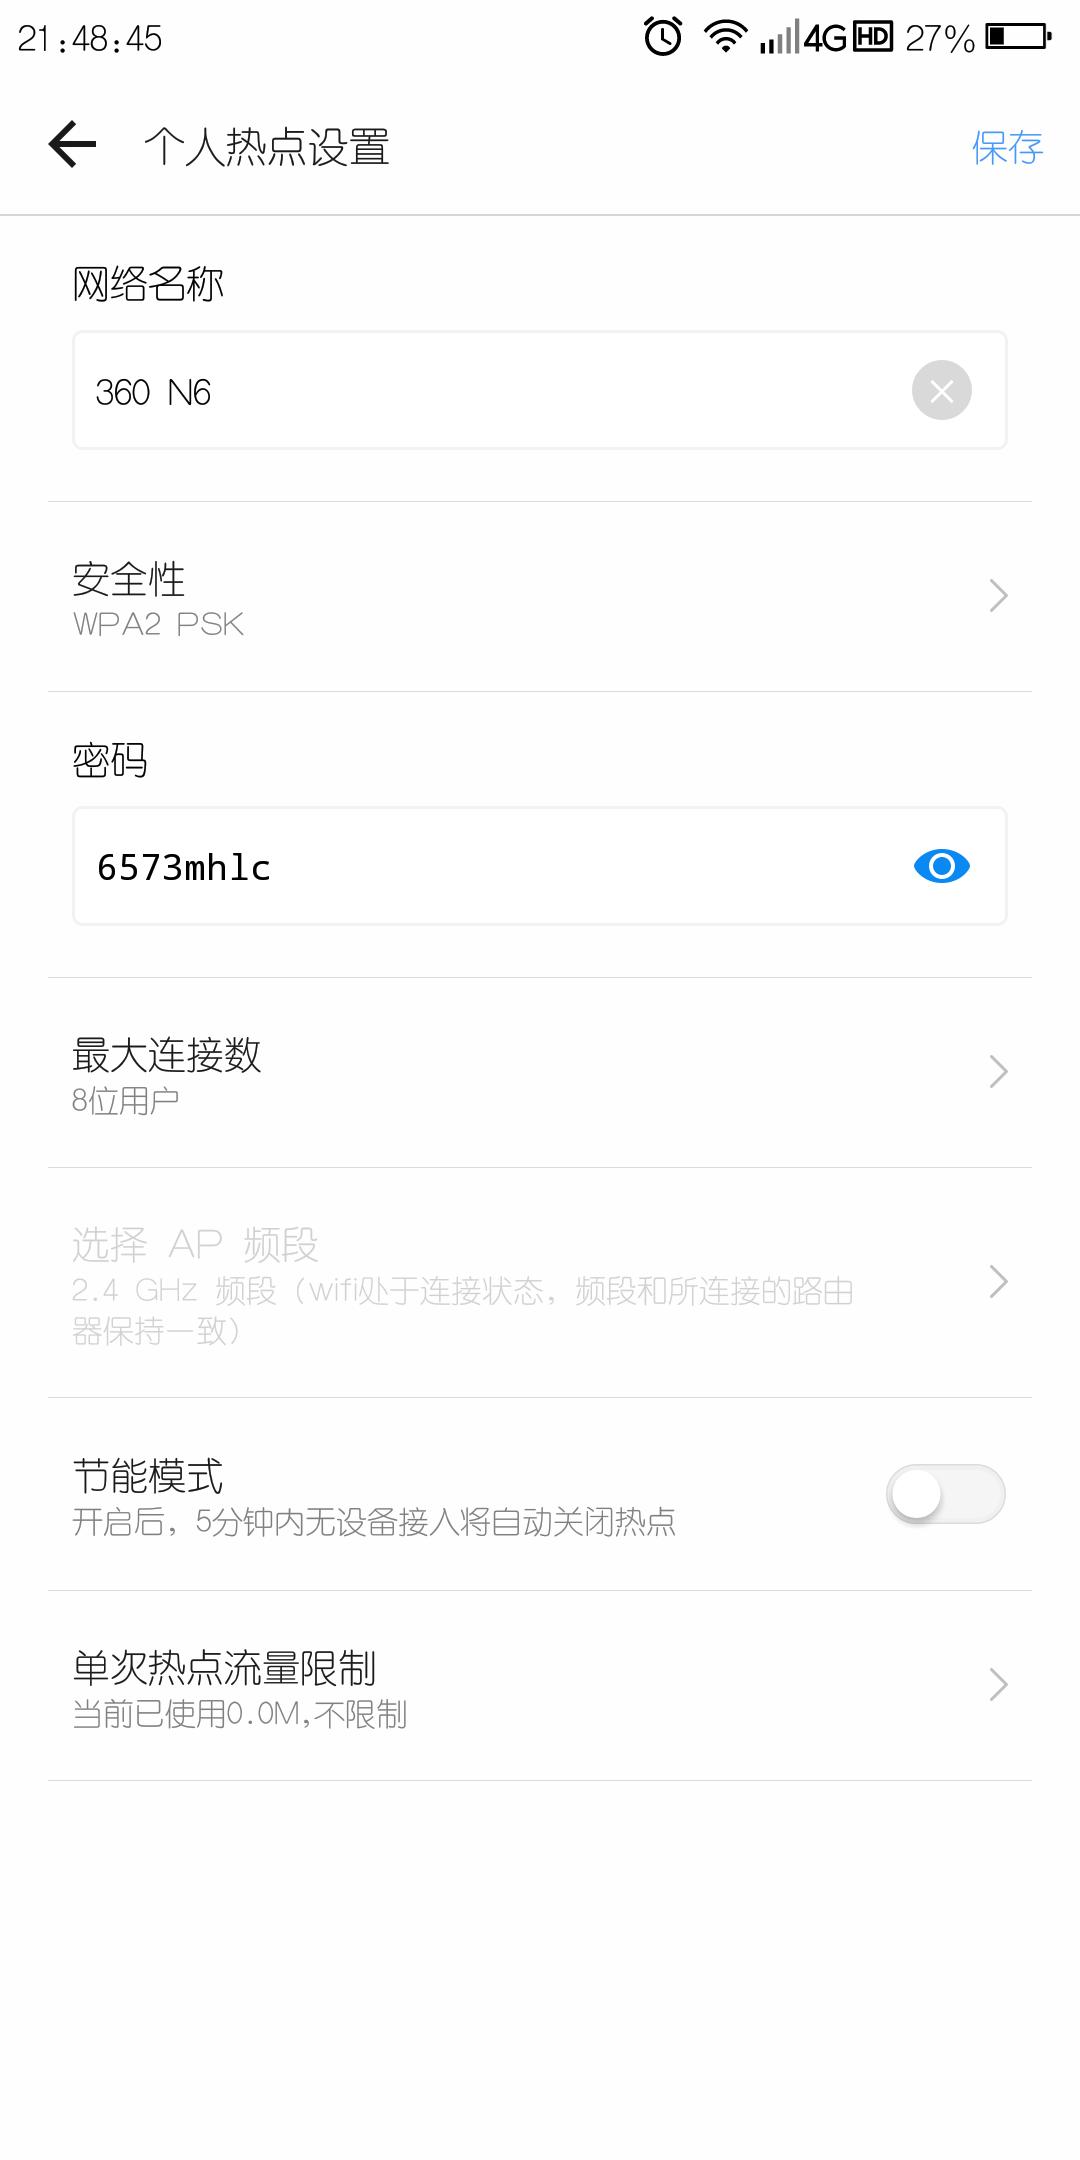 Screenshot_2020-02-16-21-48-46.png